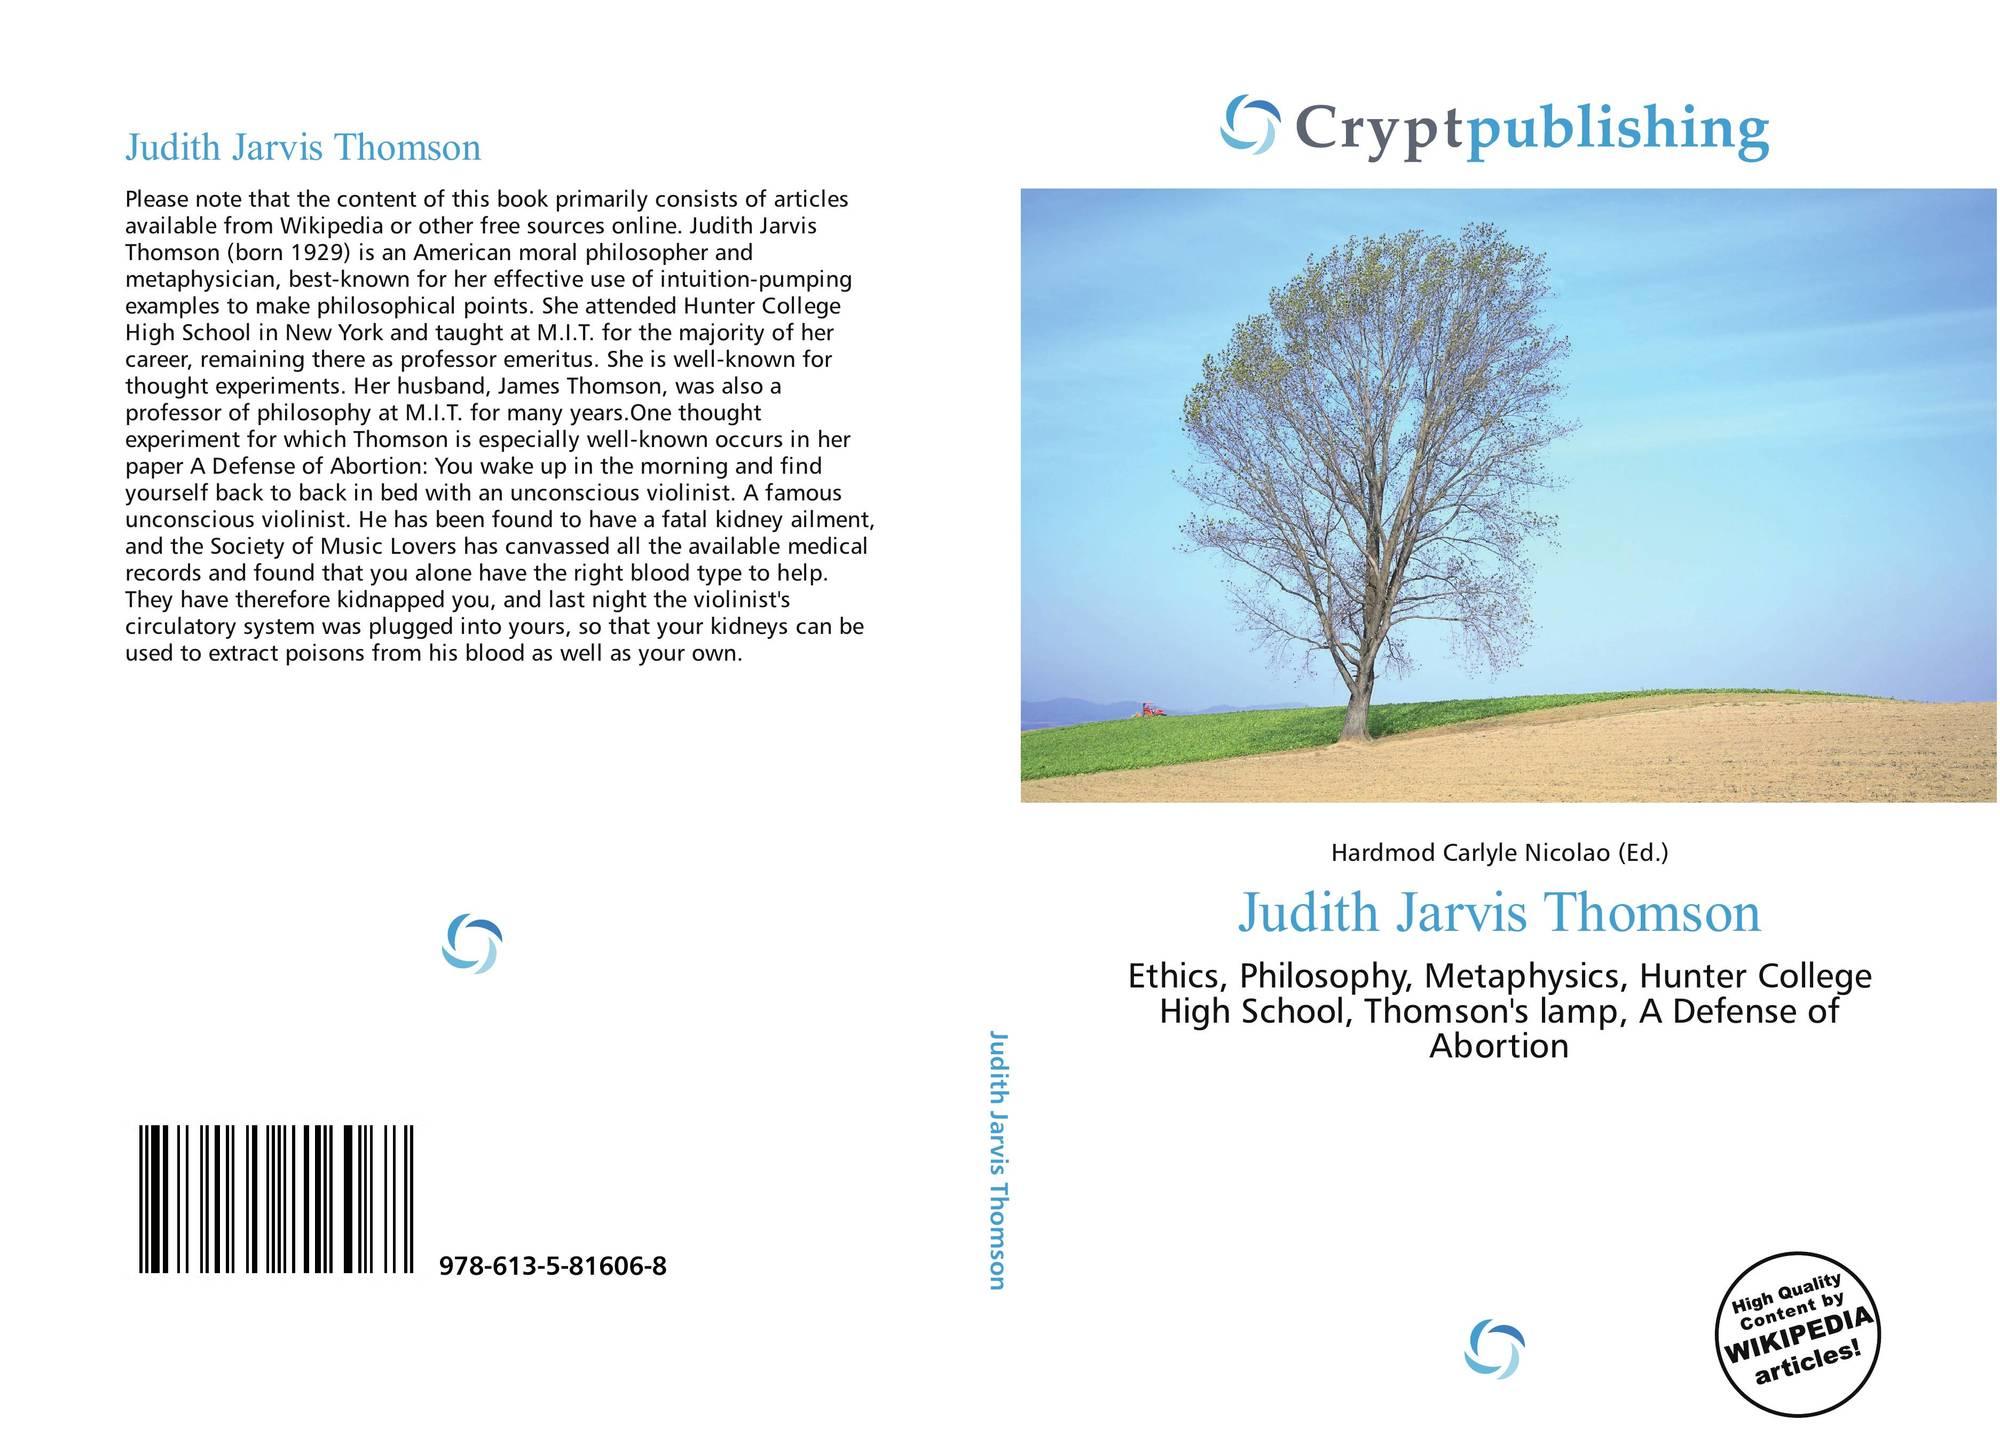 Judith Jarvis Thomson